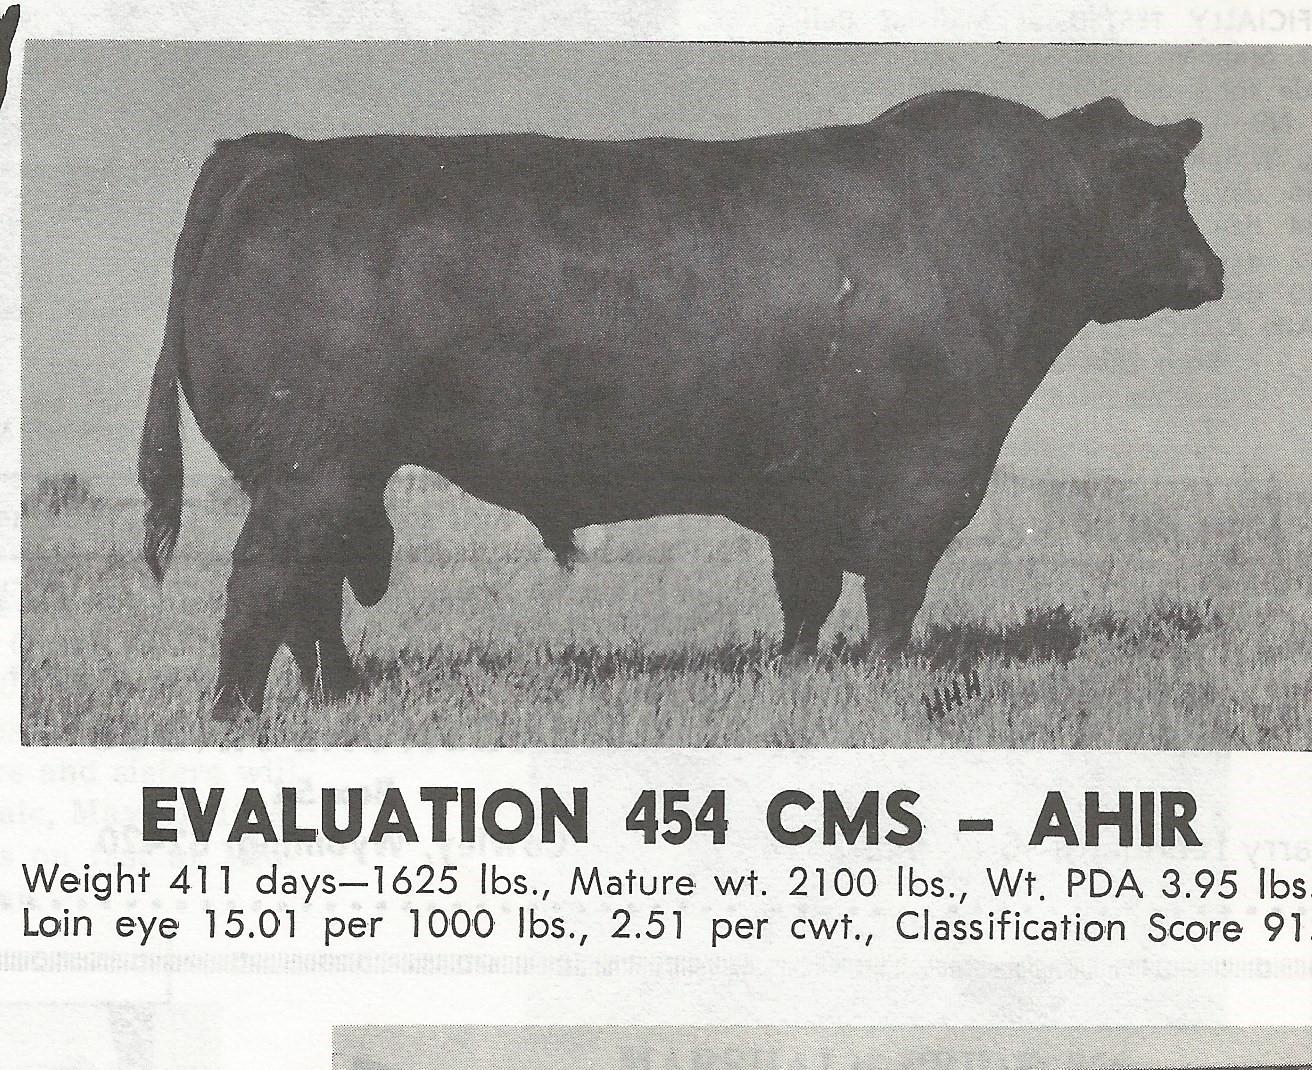 1 ampule of Evaluation 454